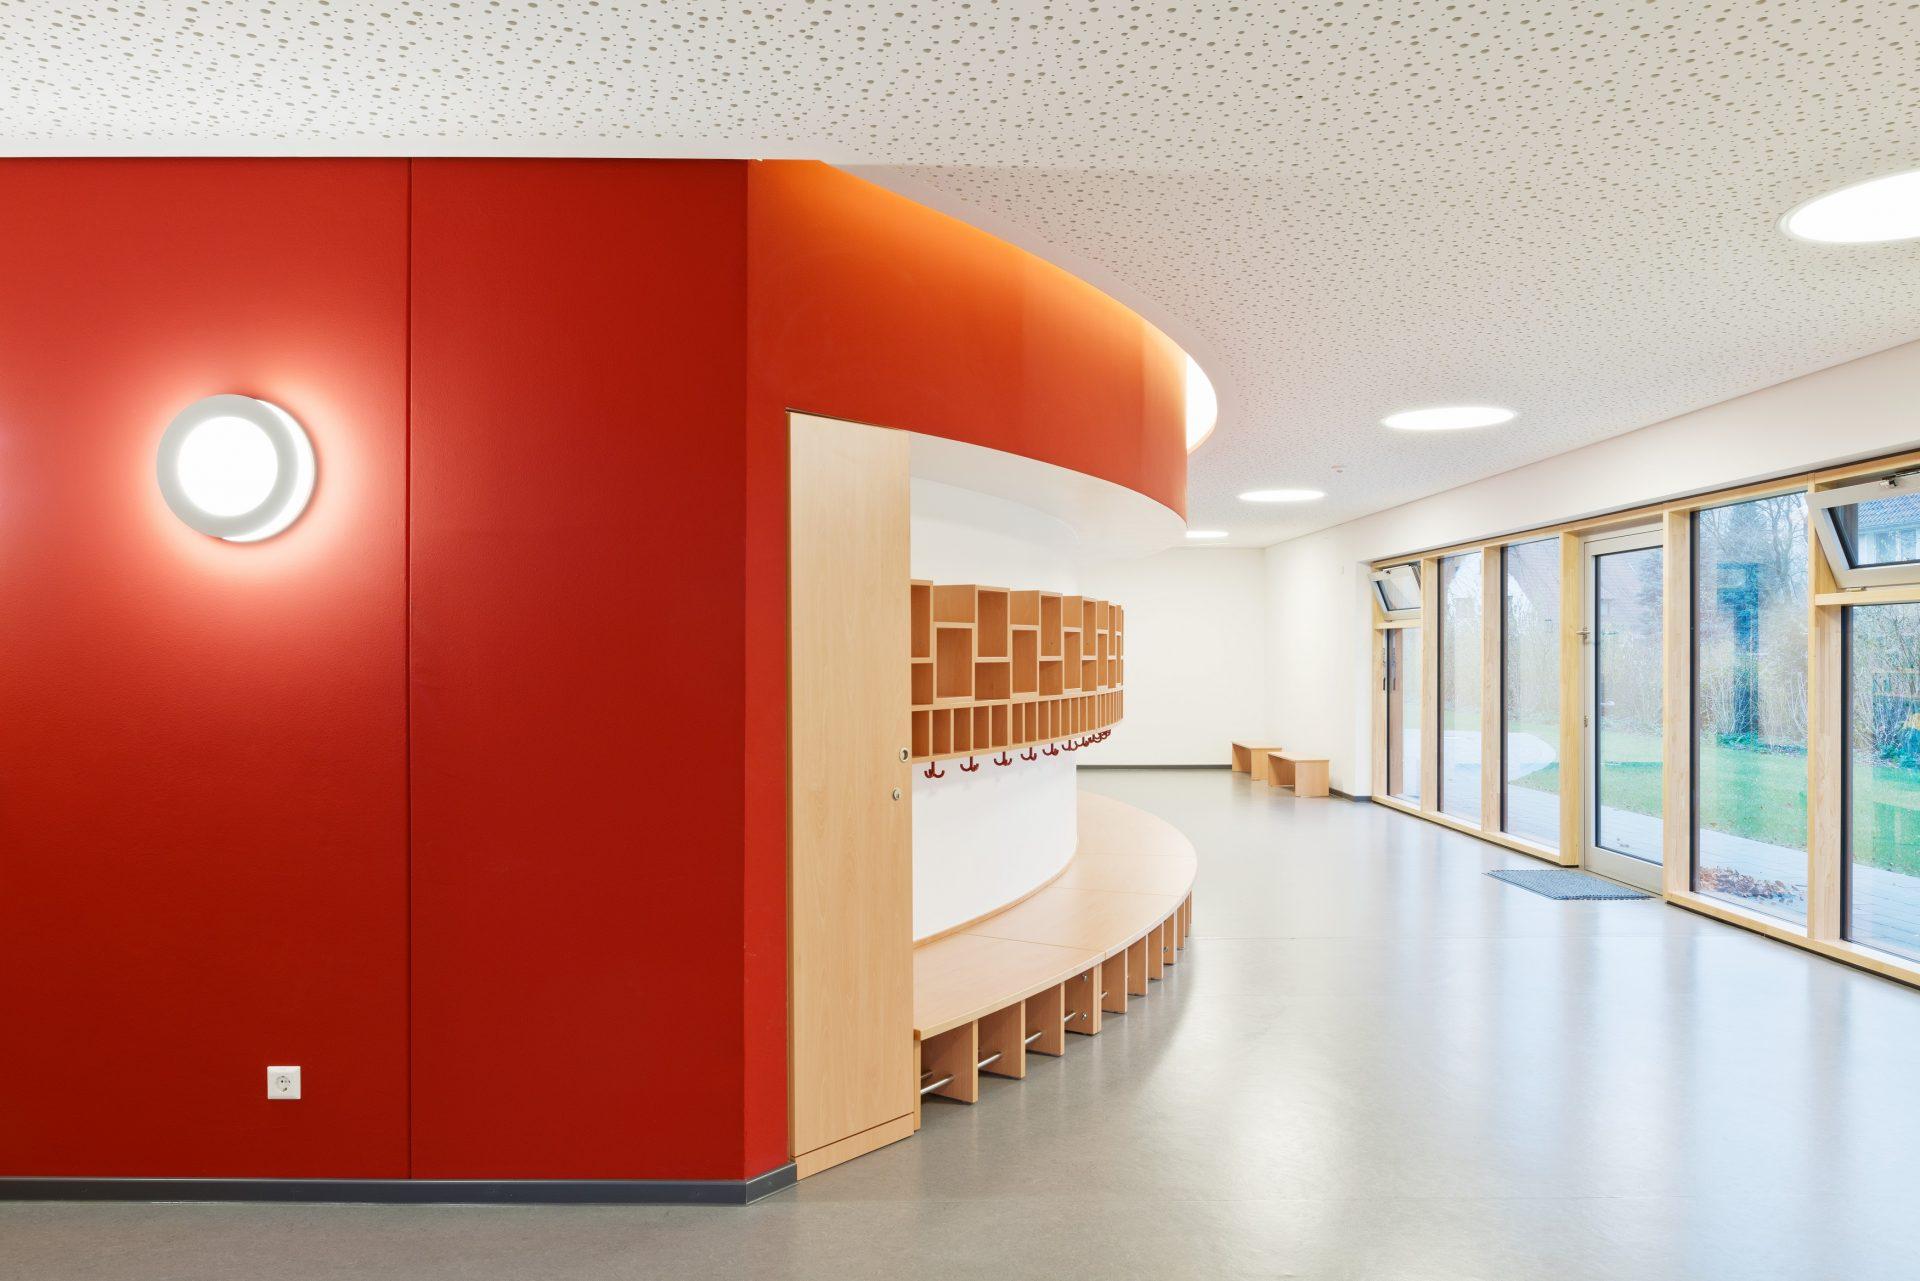 http://www.stricker-architekten.de/projekte/neubau-kita-heinrichstrasse-wunstorf/